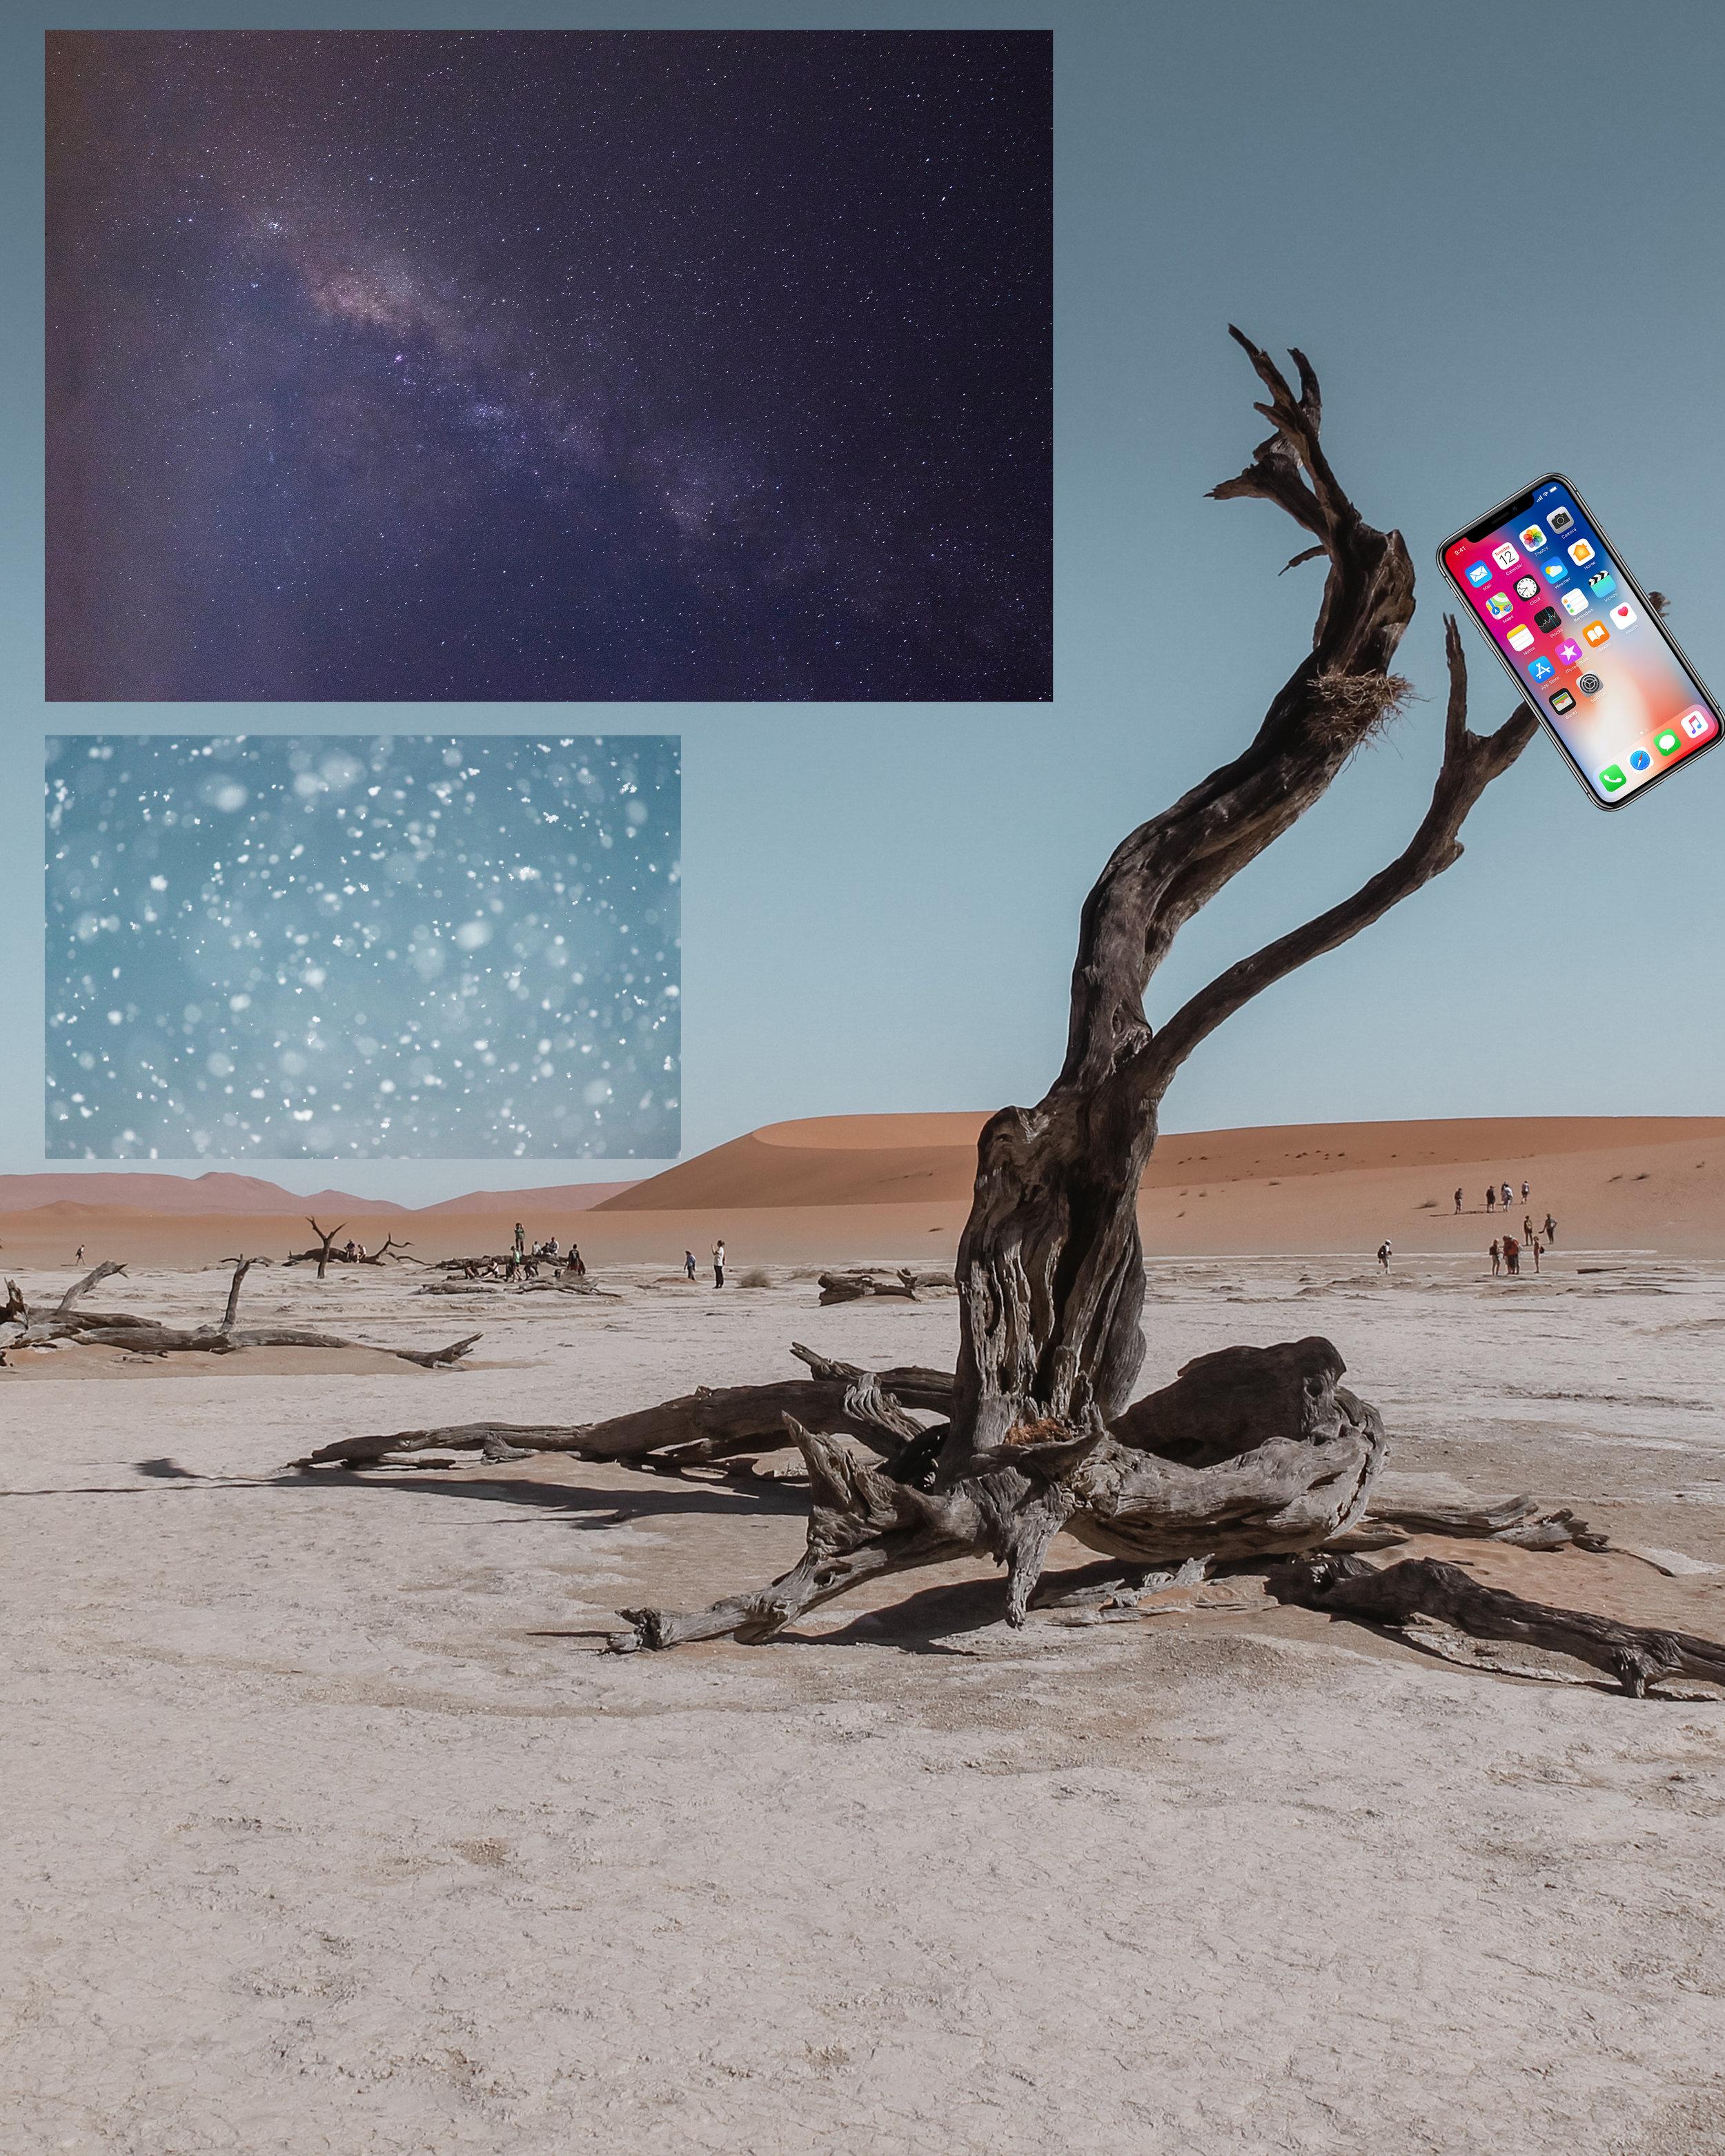 desert_clocks_unedited.jpg